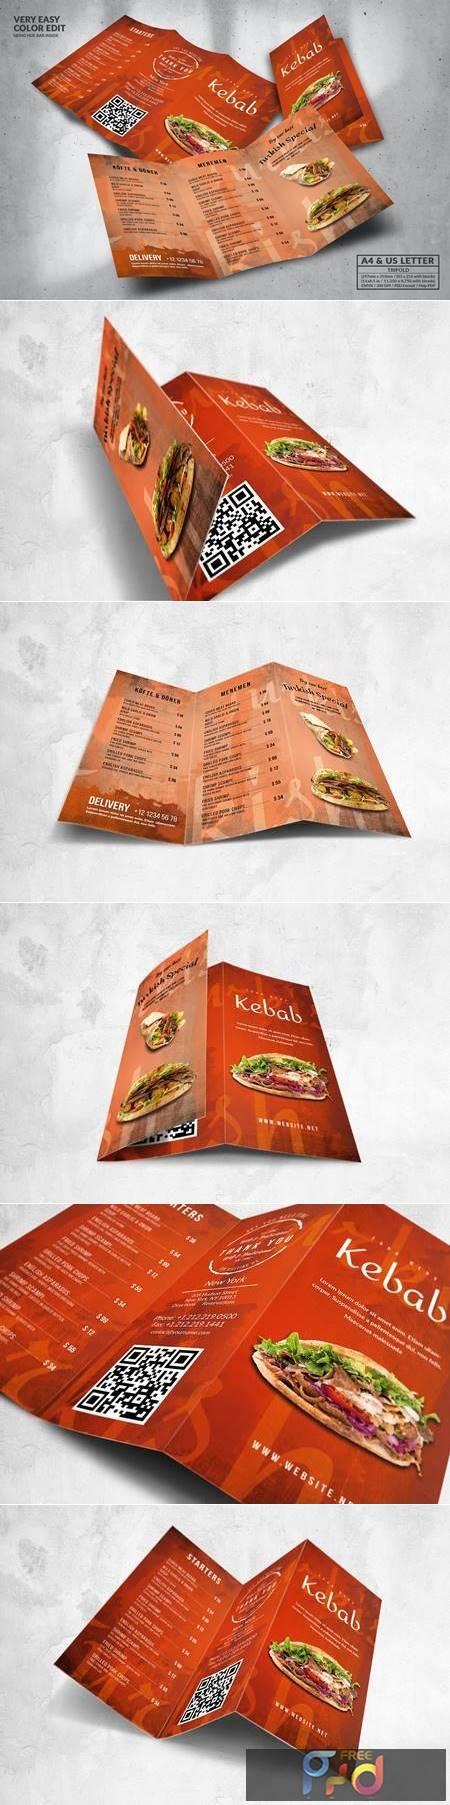 Trifold Food Menu Design A4 & US Letter U8VB5WY 1